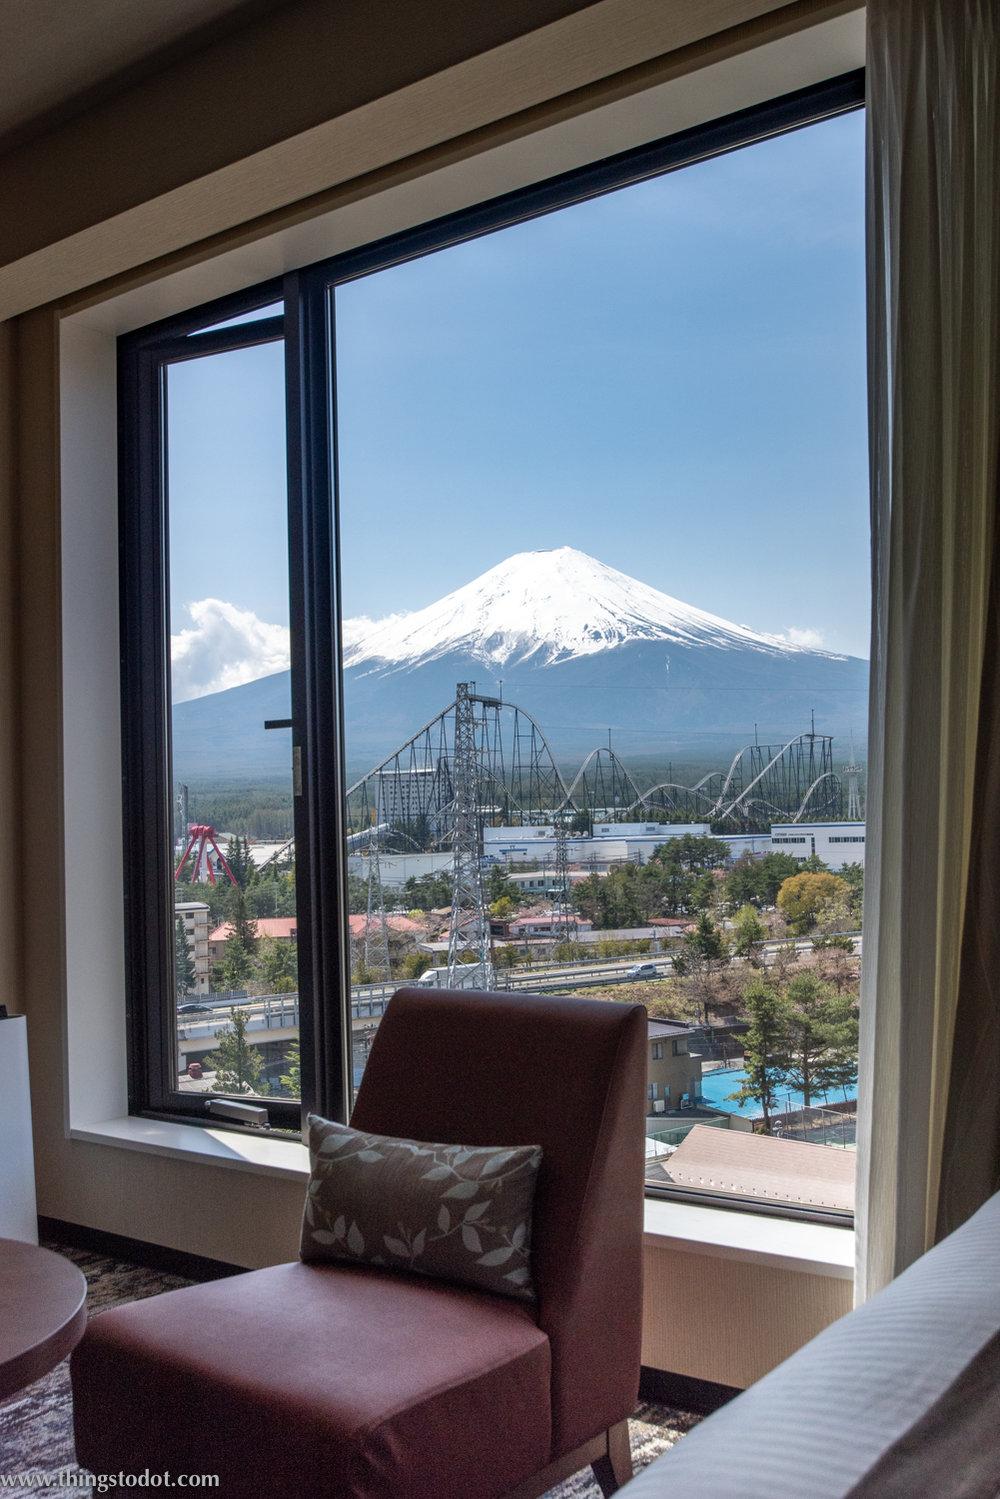 HOTEL MYSTAYS Fuji Onsen Resort, Fuji, Japan. Photo: Gunjan Virk.Image©www.thingstodot.com.